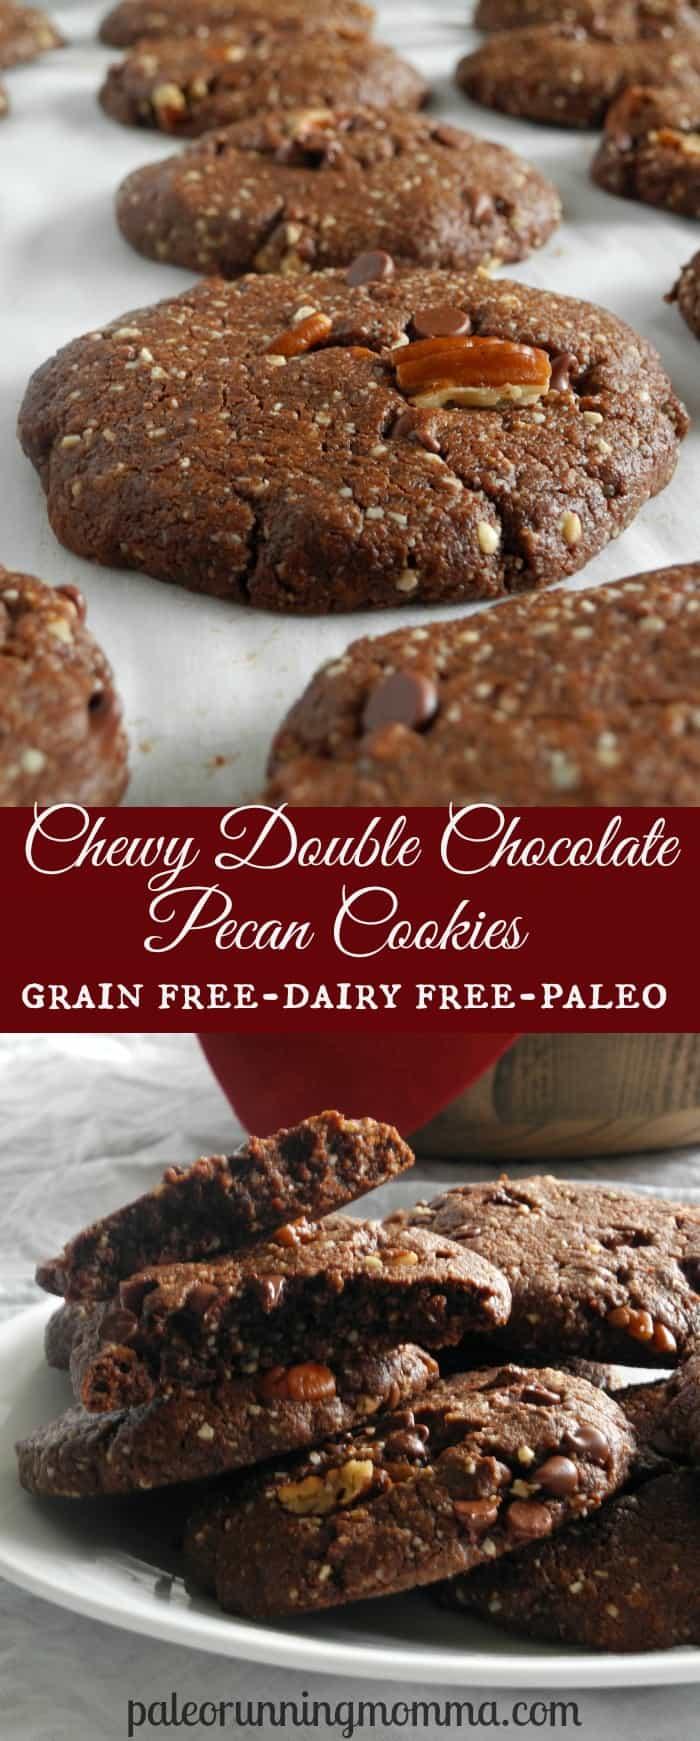 Chewy Double Chocolate Pecan Cookies #grainfree #dairyfree #paleo @paleorunmomma